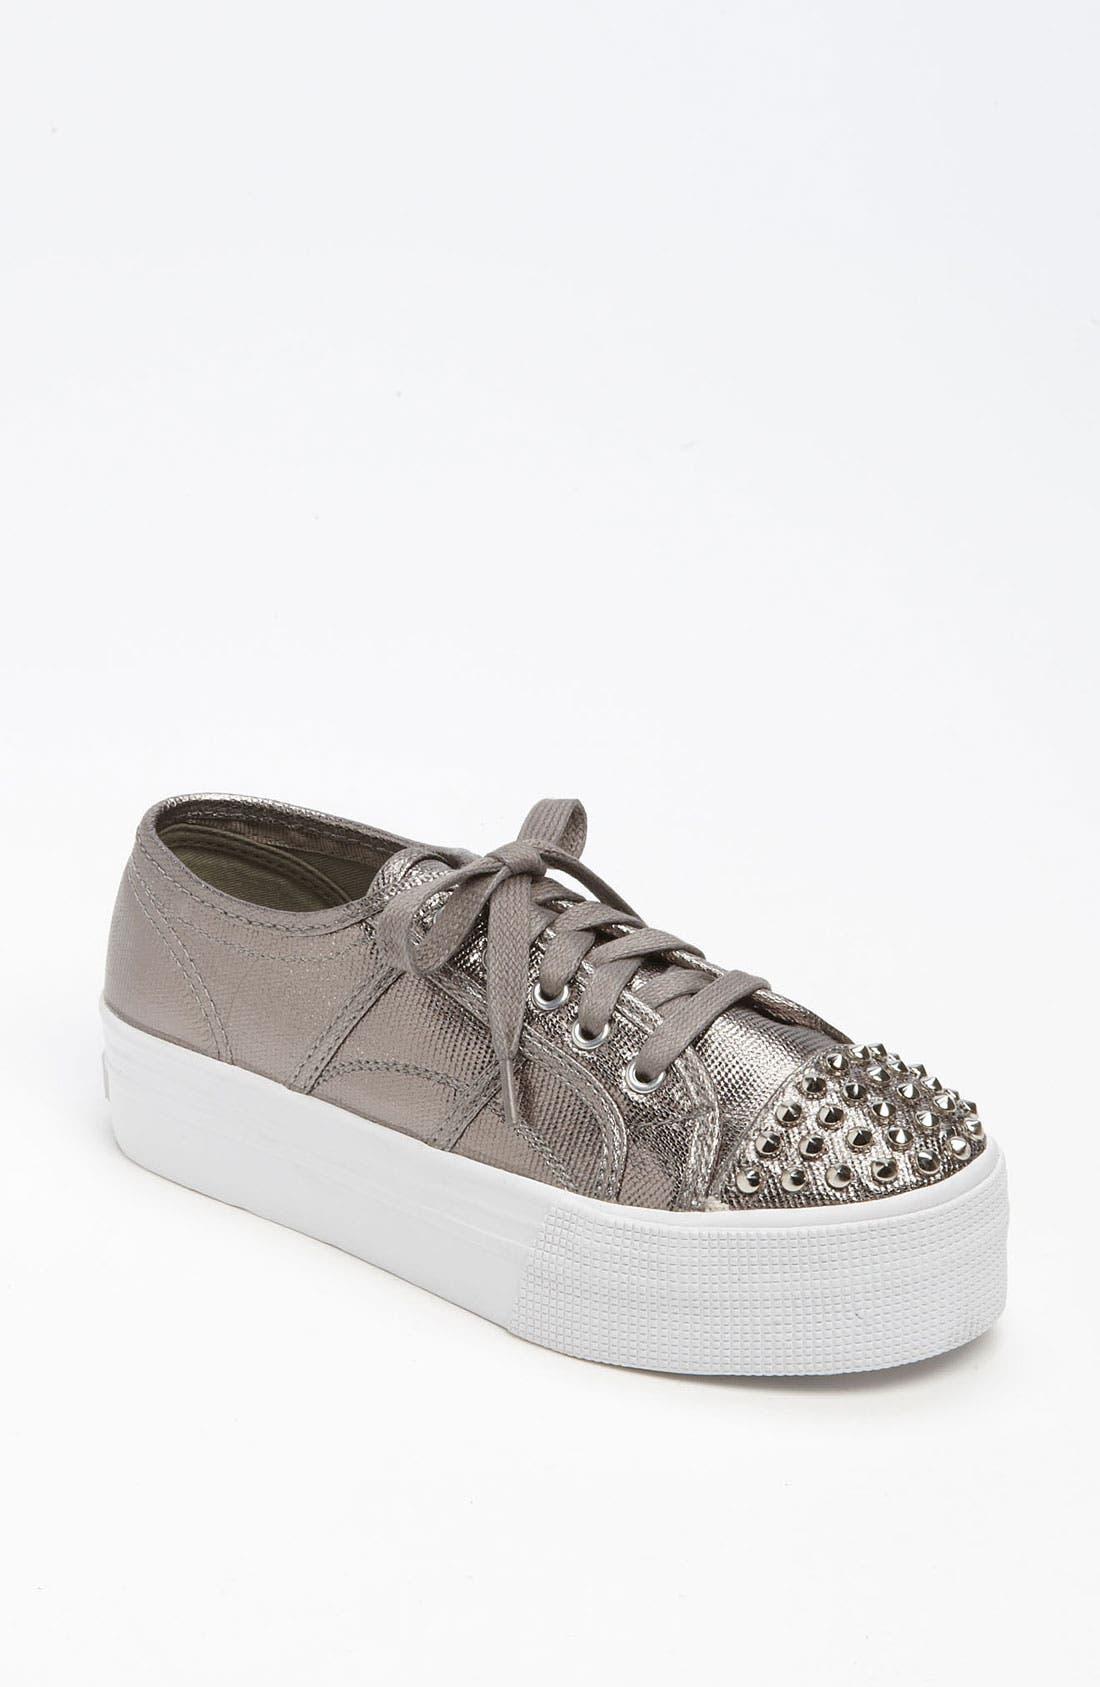 Main Image - Steve Madden 'Braady-S' Platform Sneaker